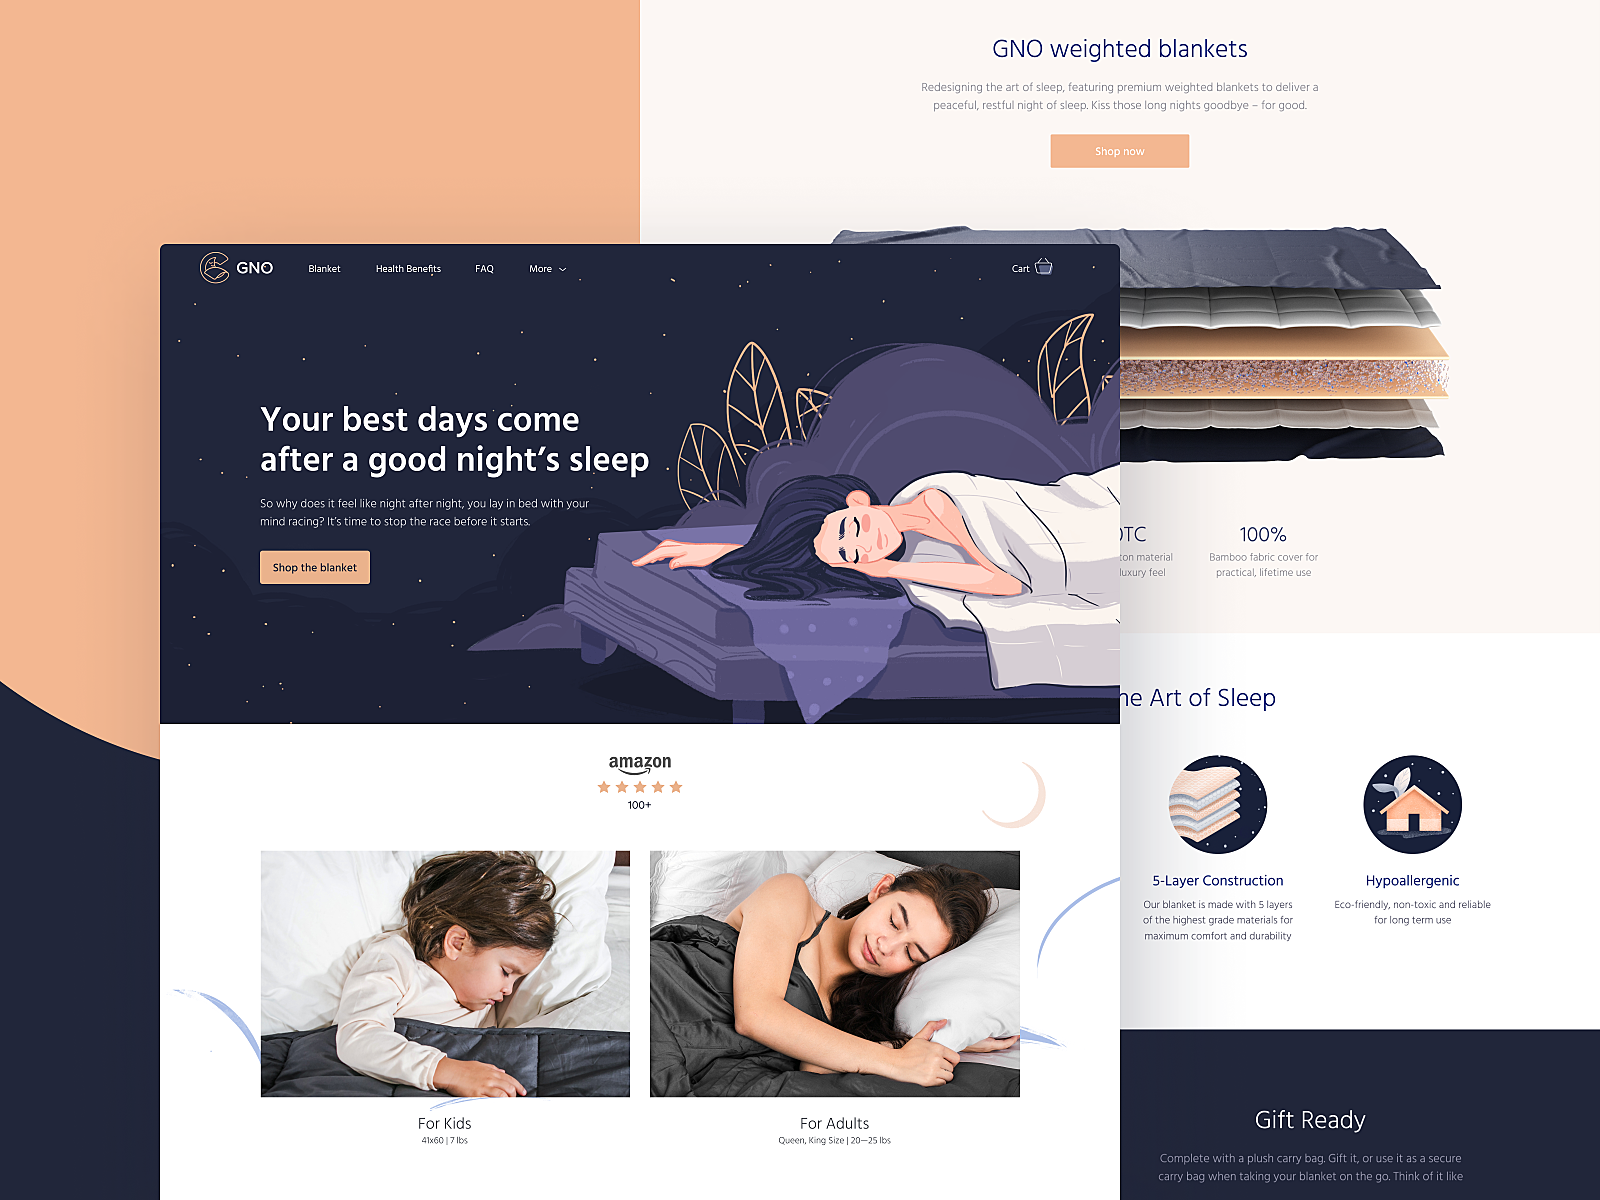 gno blankets website design